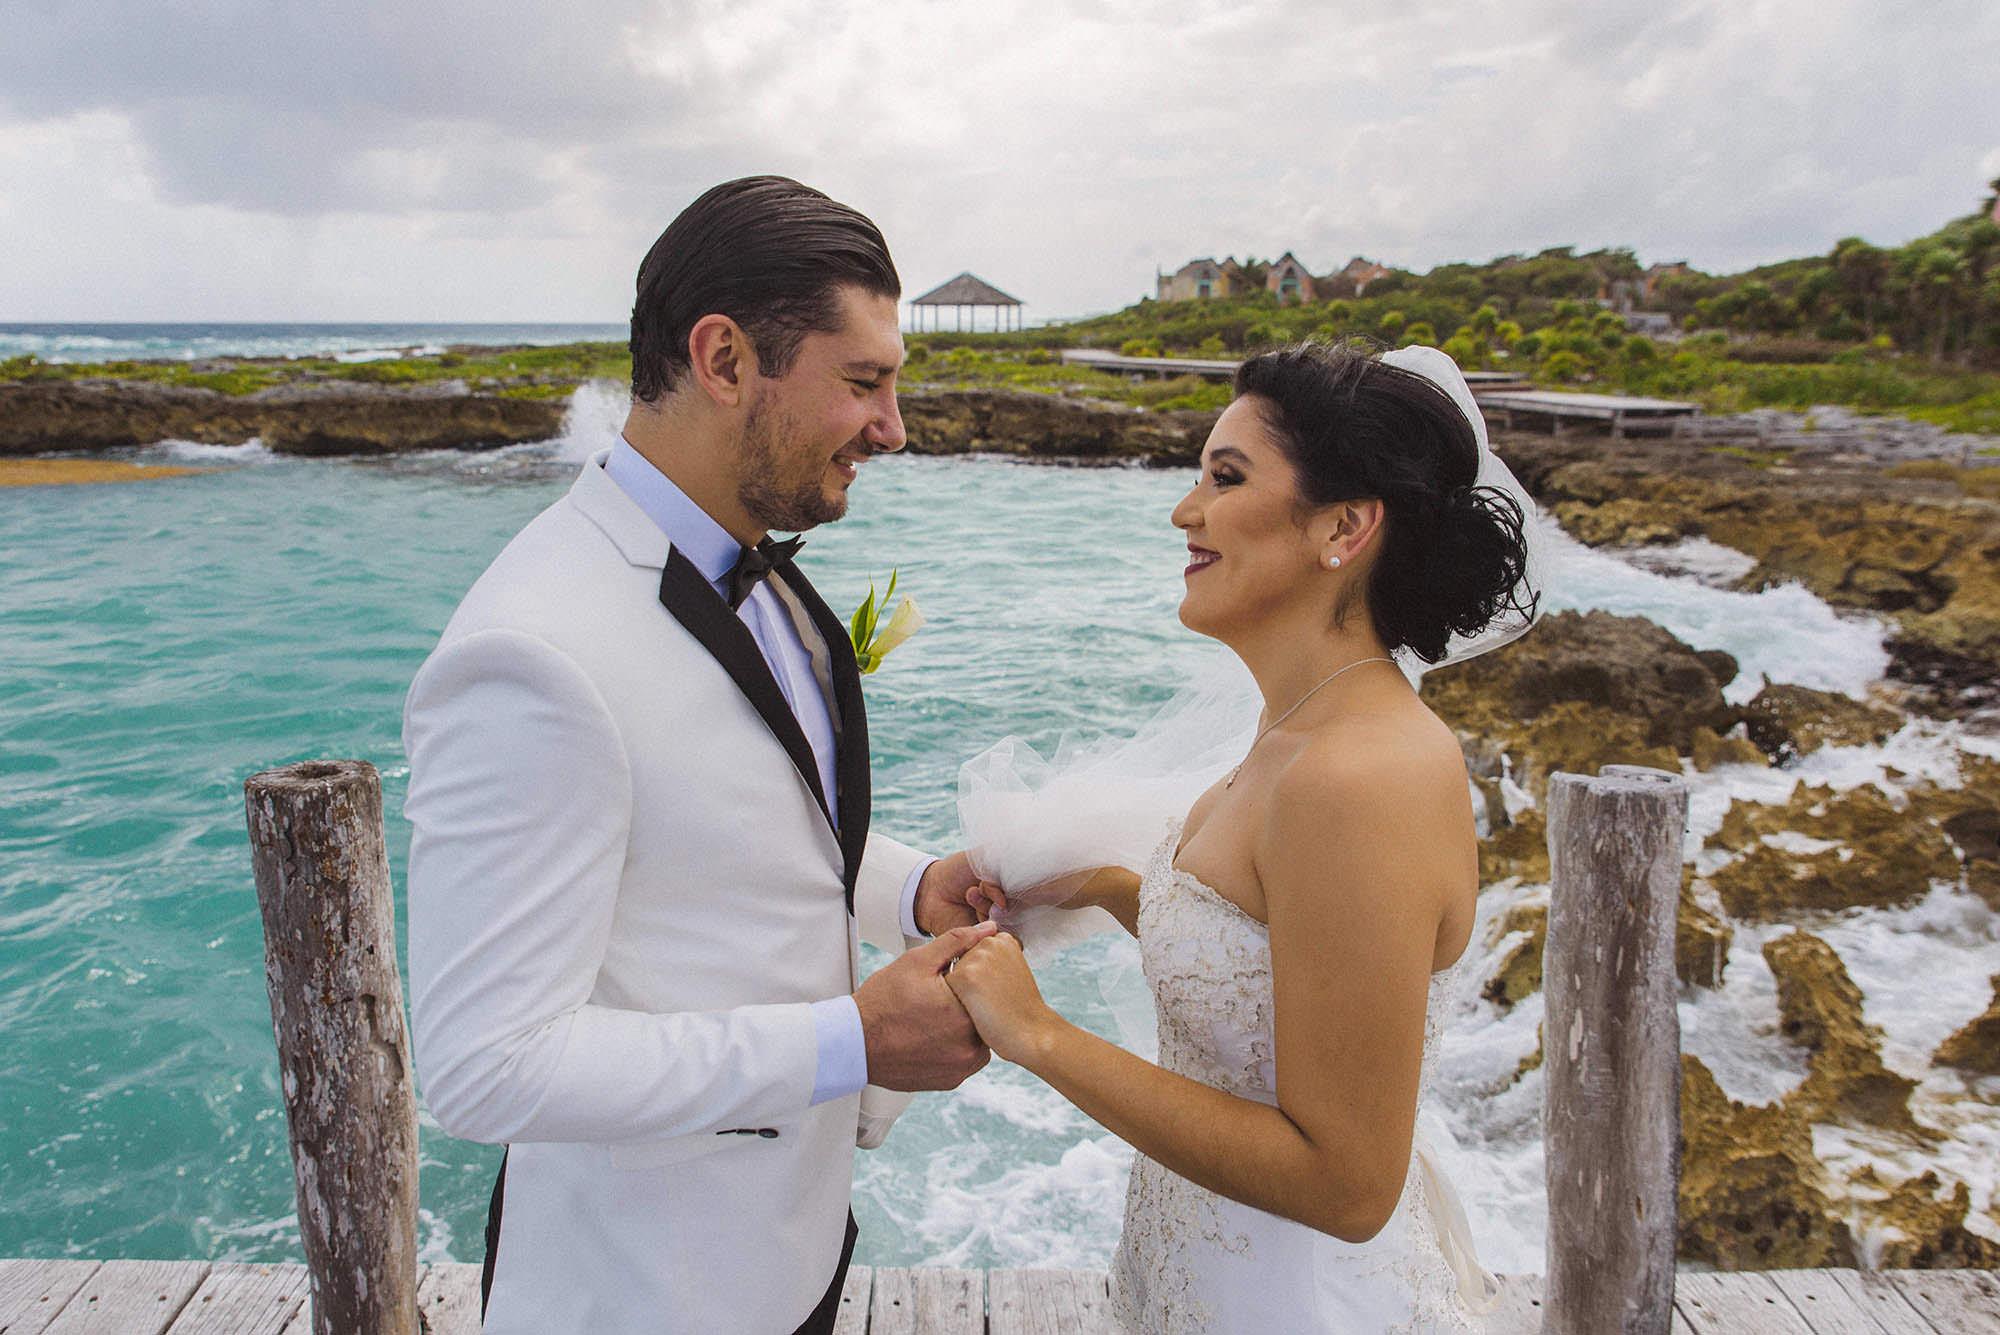 Wedding playa del carmen planner destination mexico magali espinosa21-WEB.jpg